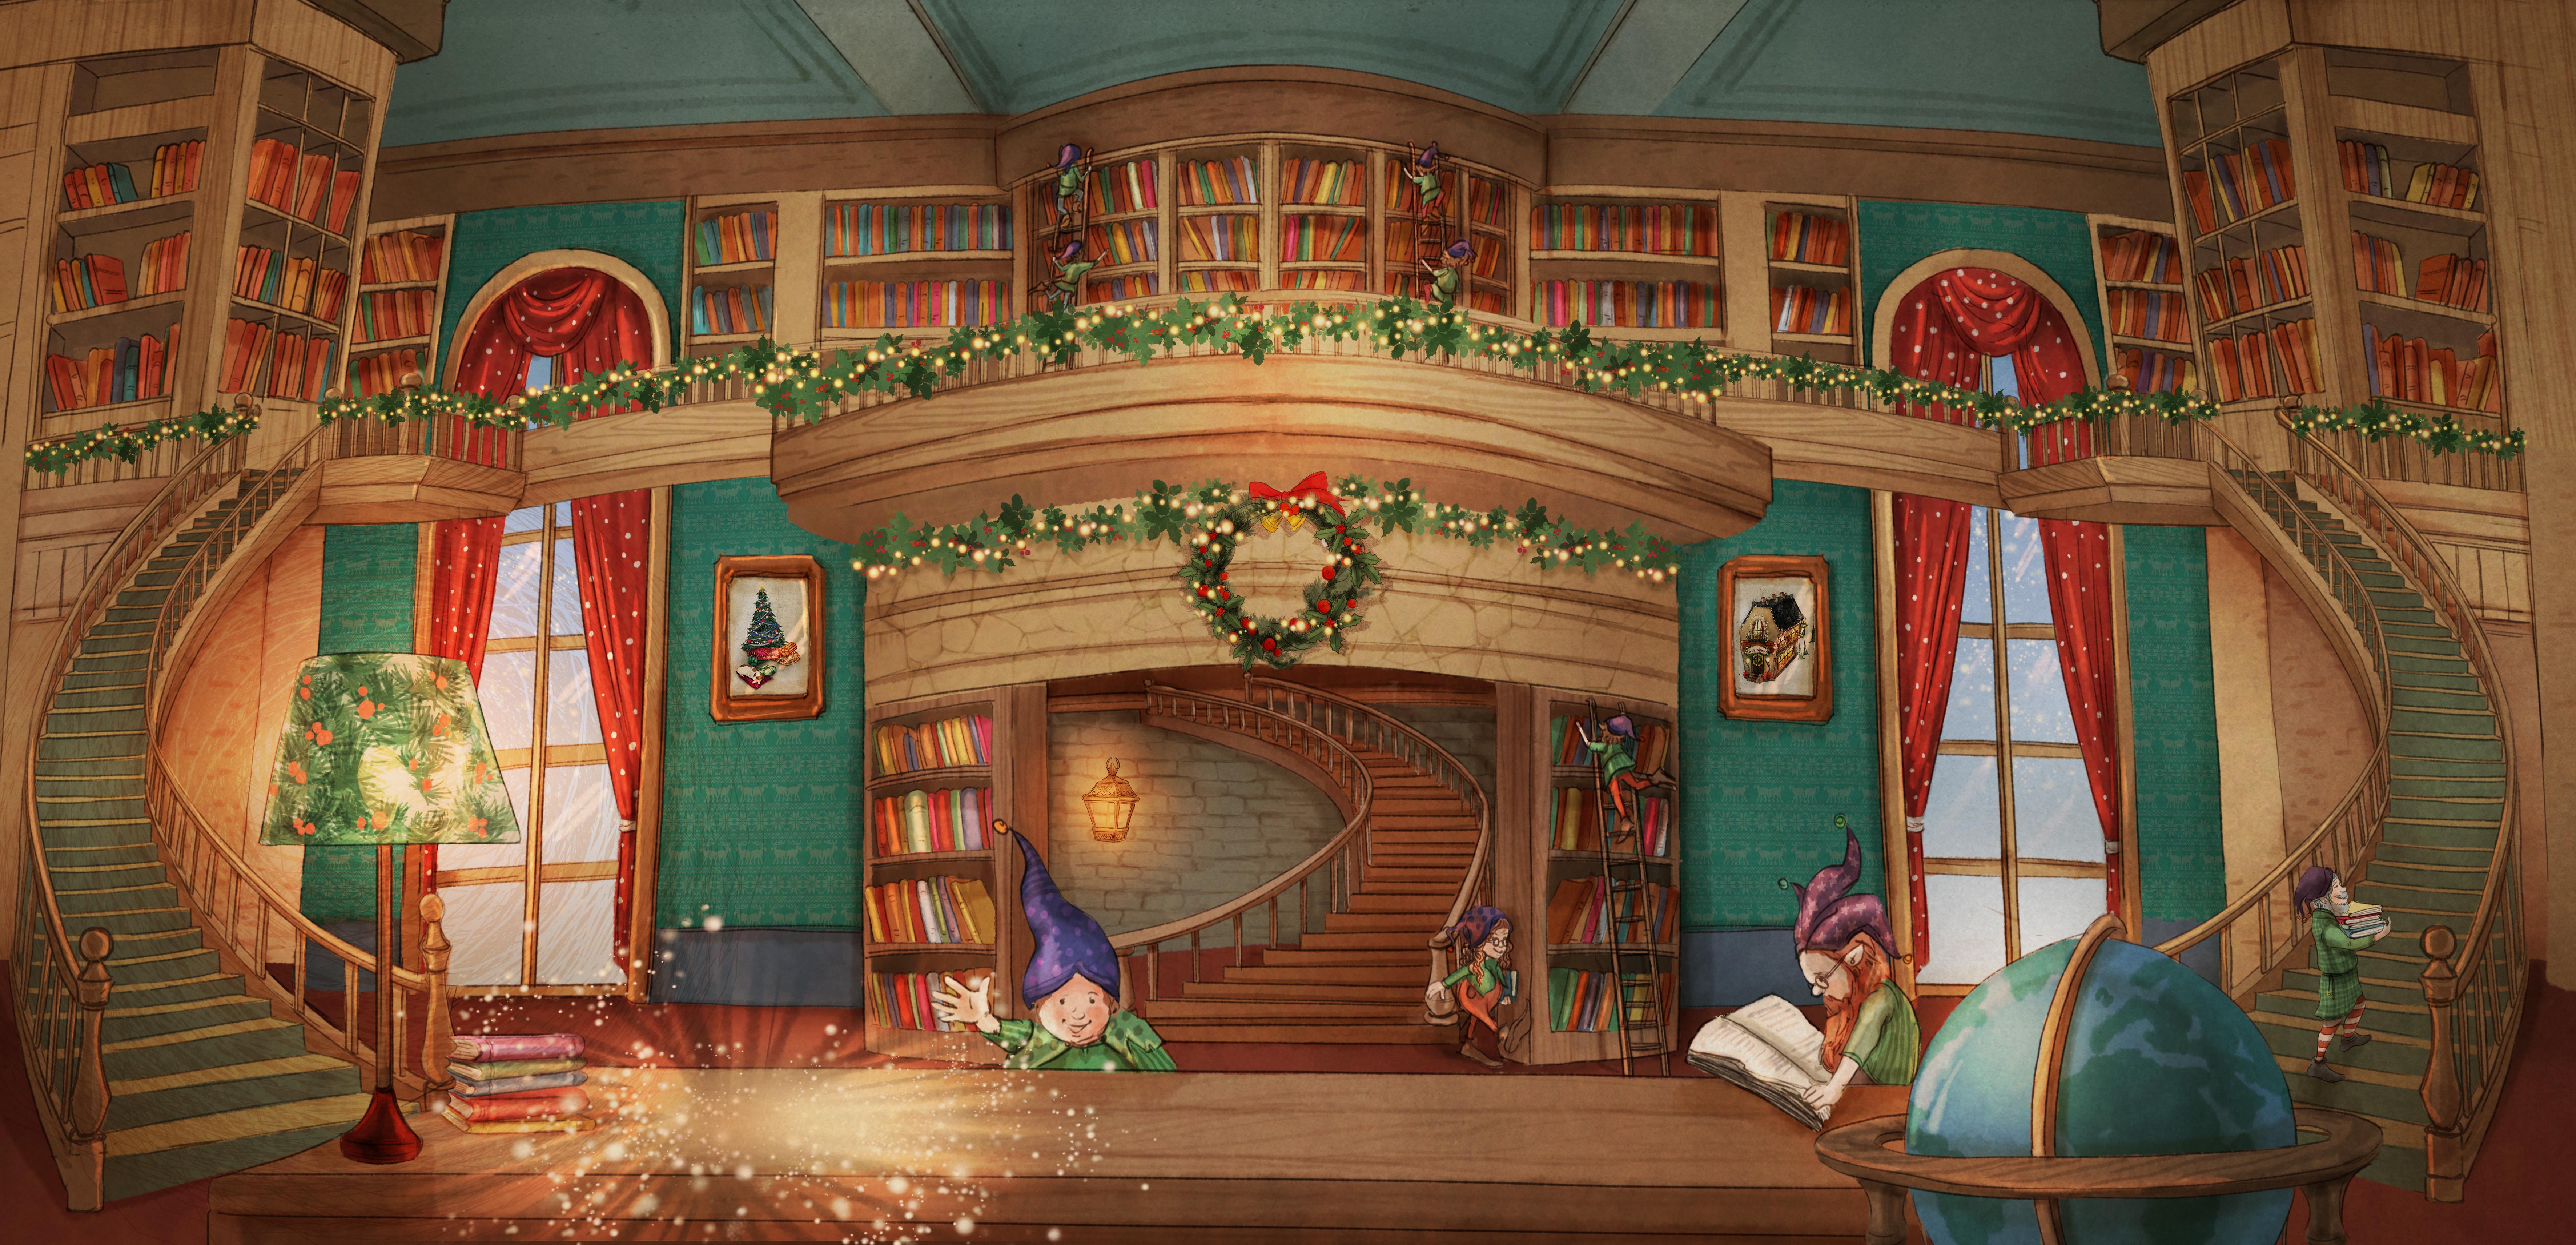 Santa's library